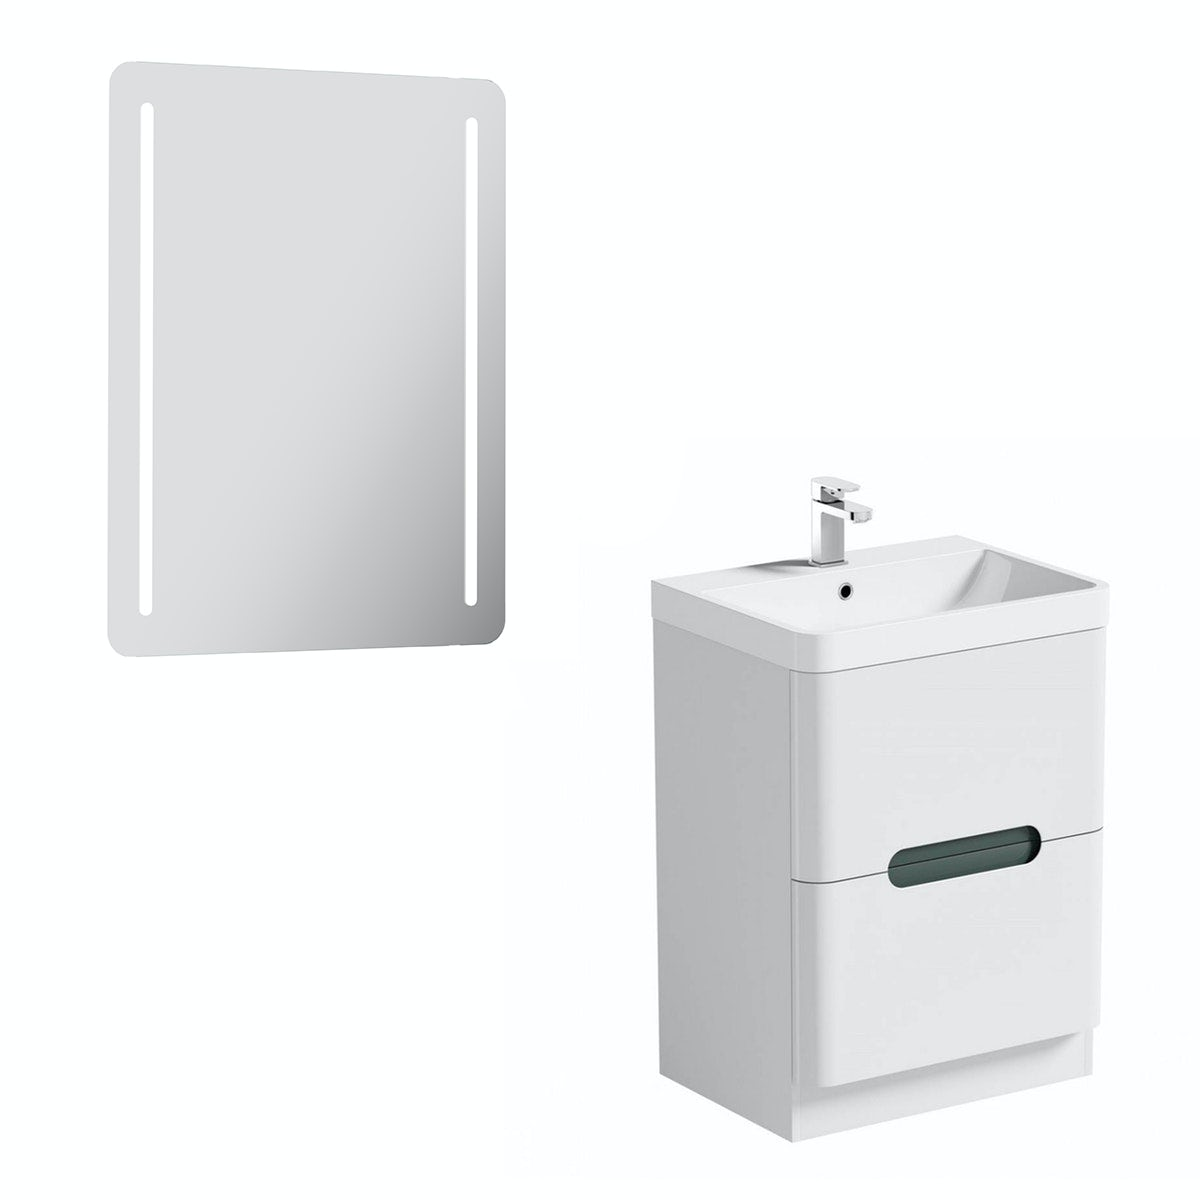 Mode Ellis slate vanity unit 600mm and mirror offer